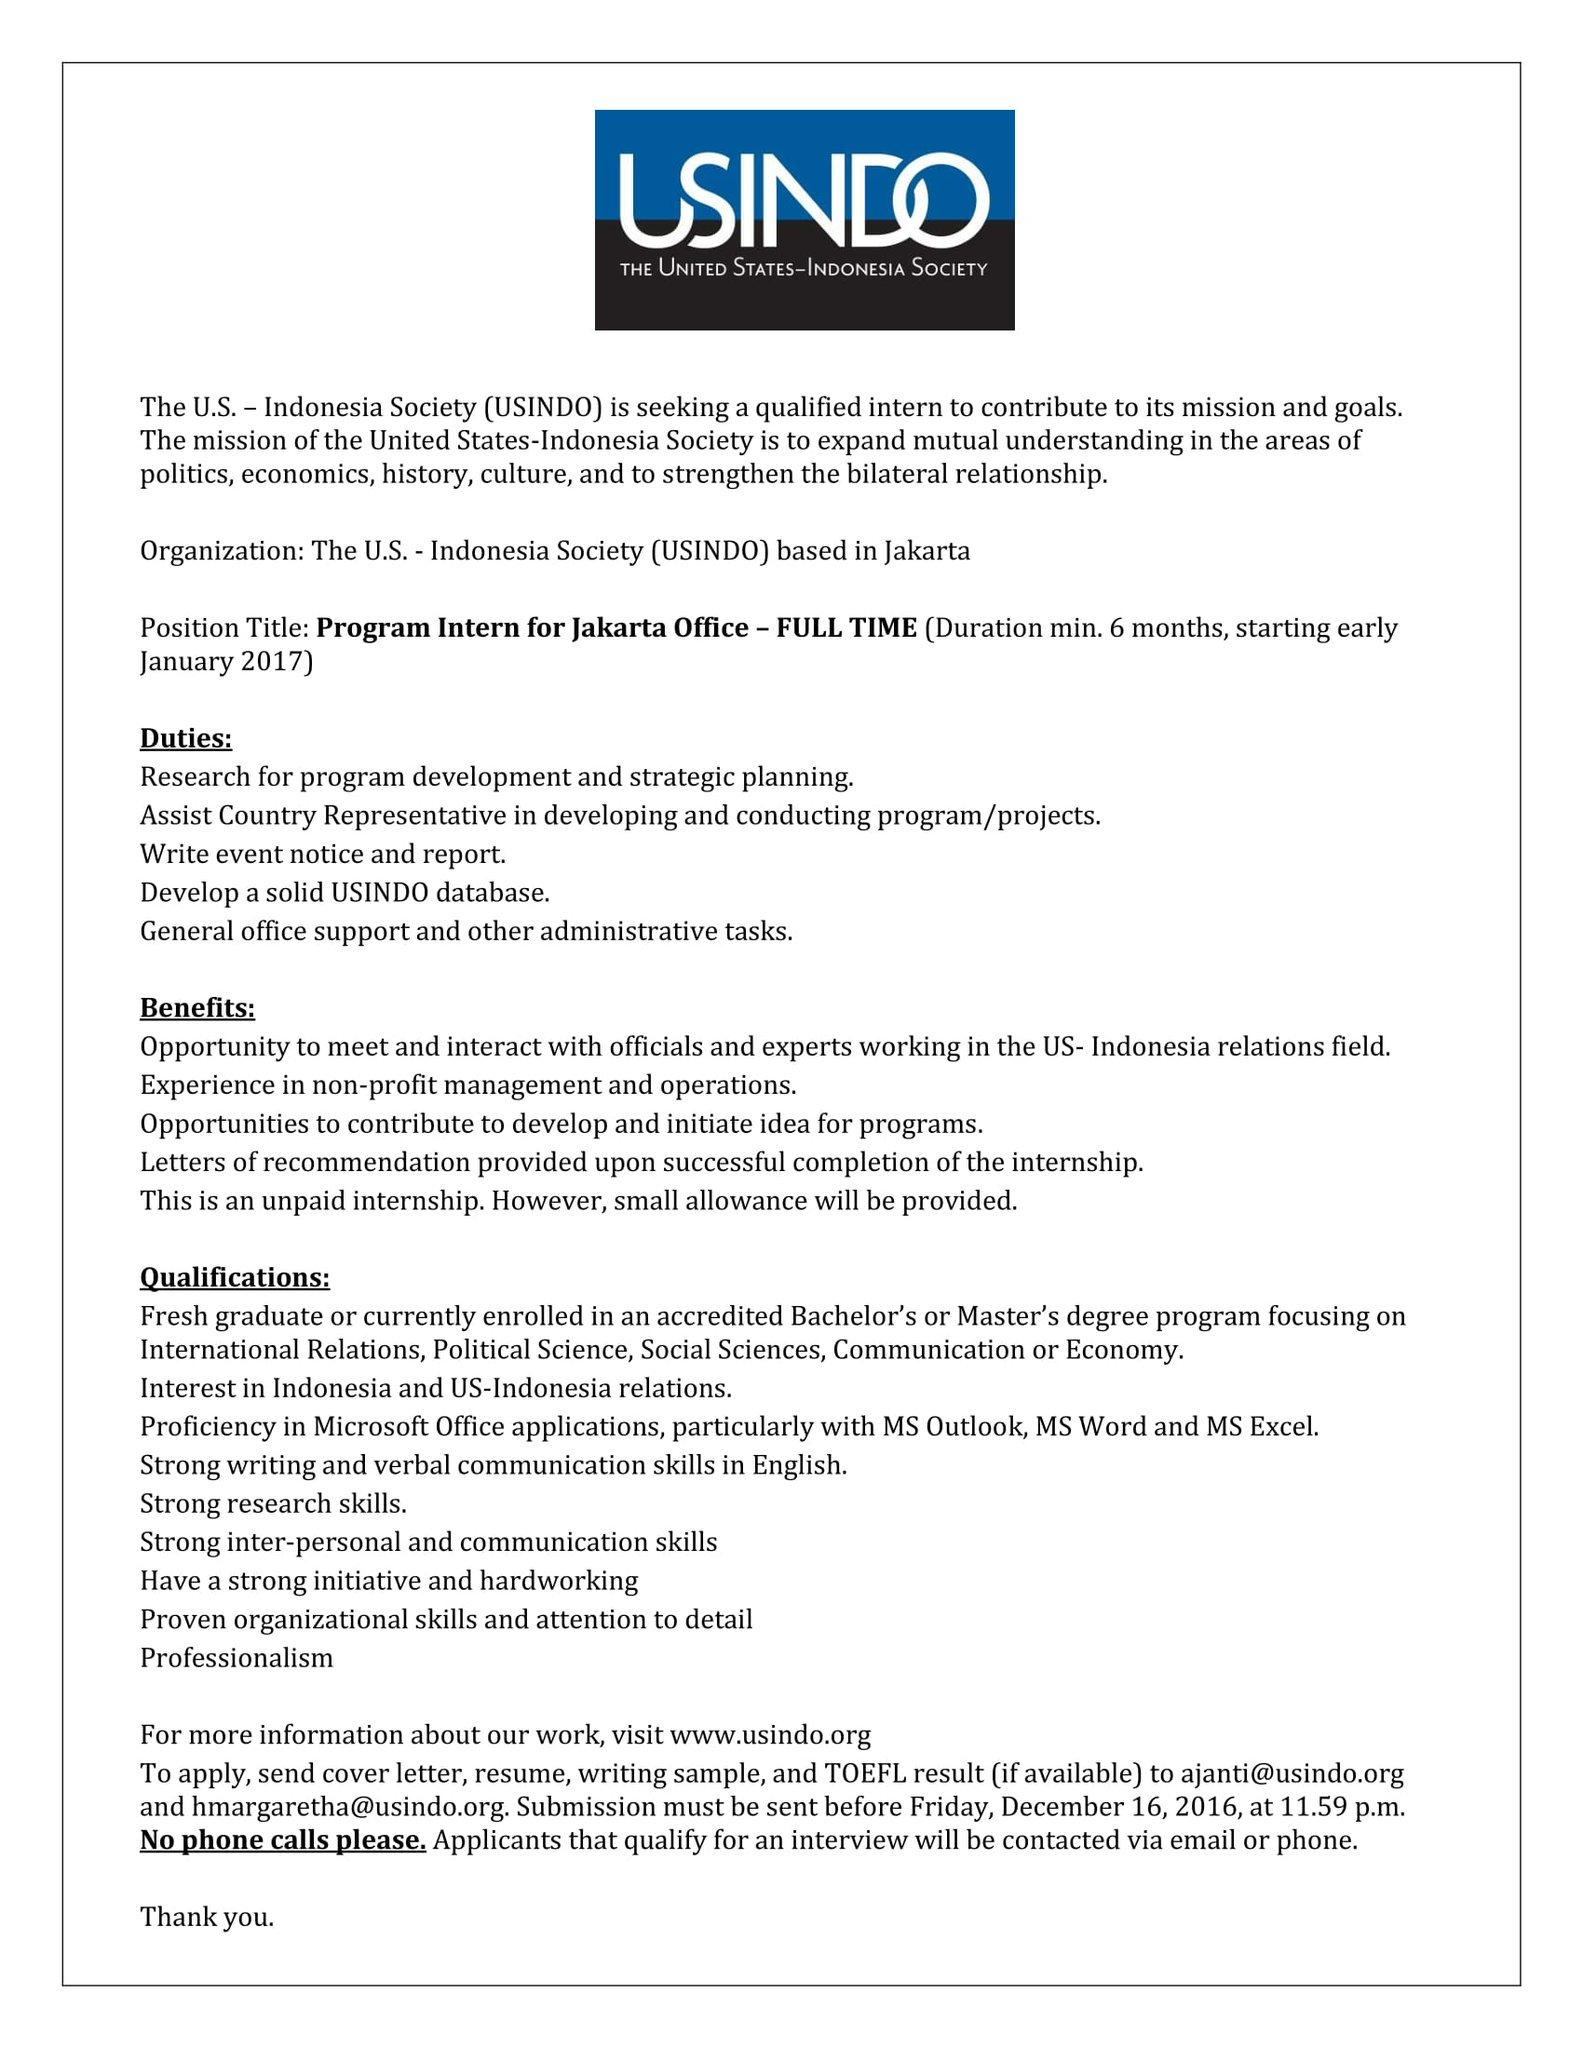 Application Letter For Fresh Graduate Social Work best ideas – Social Work Intern Job Description